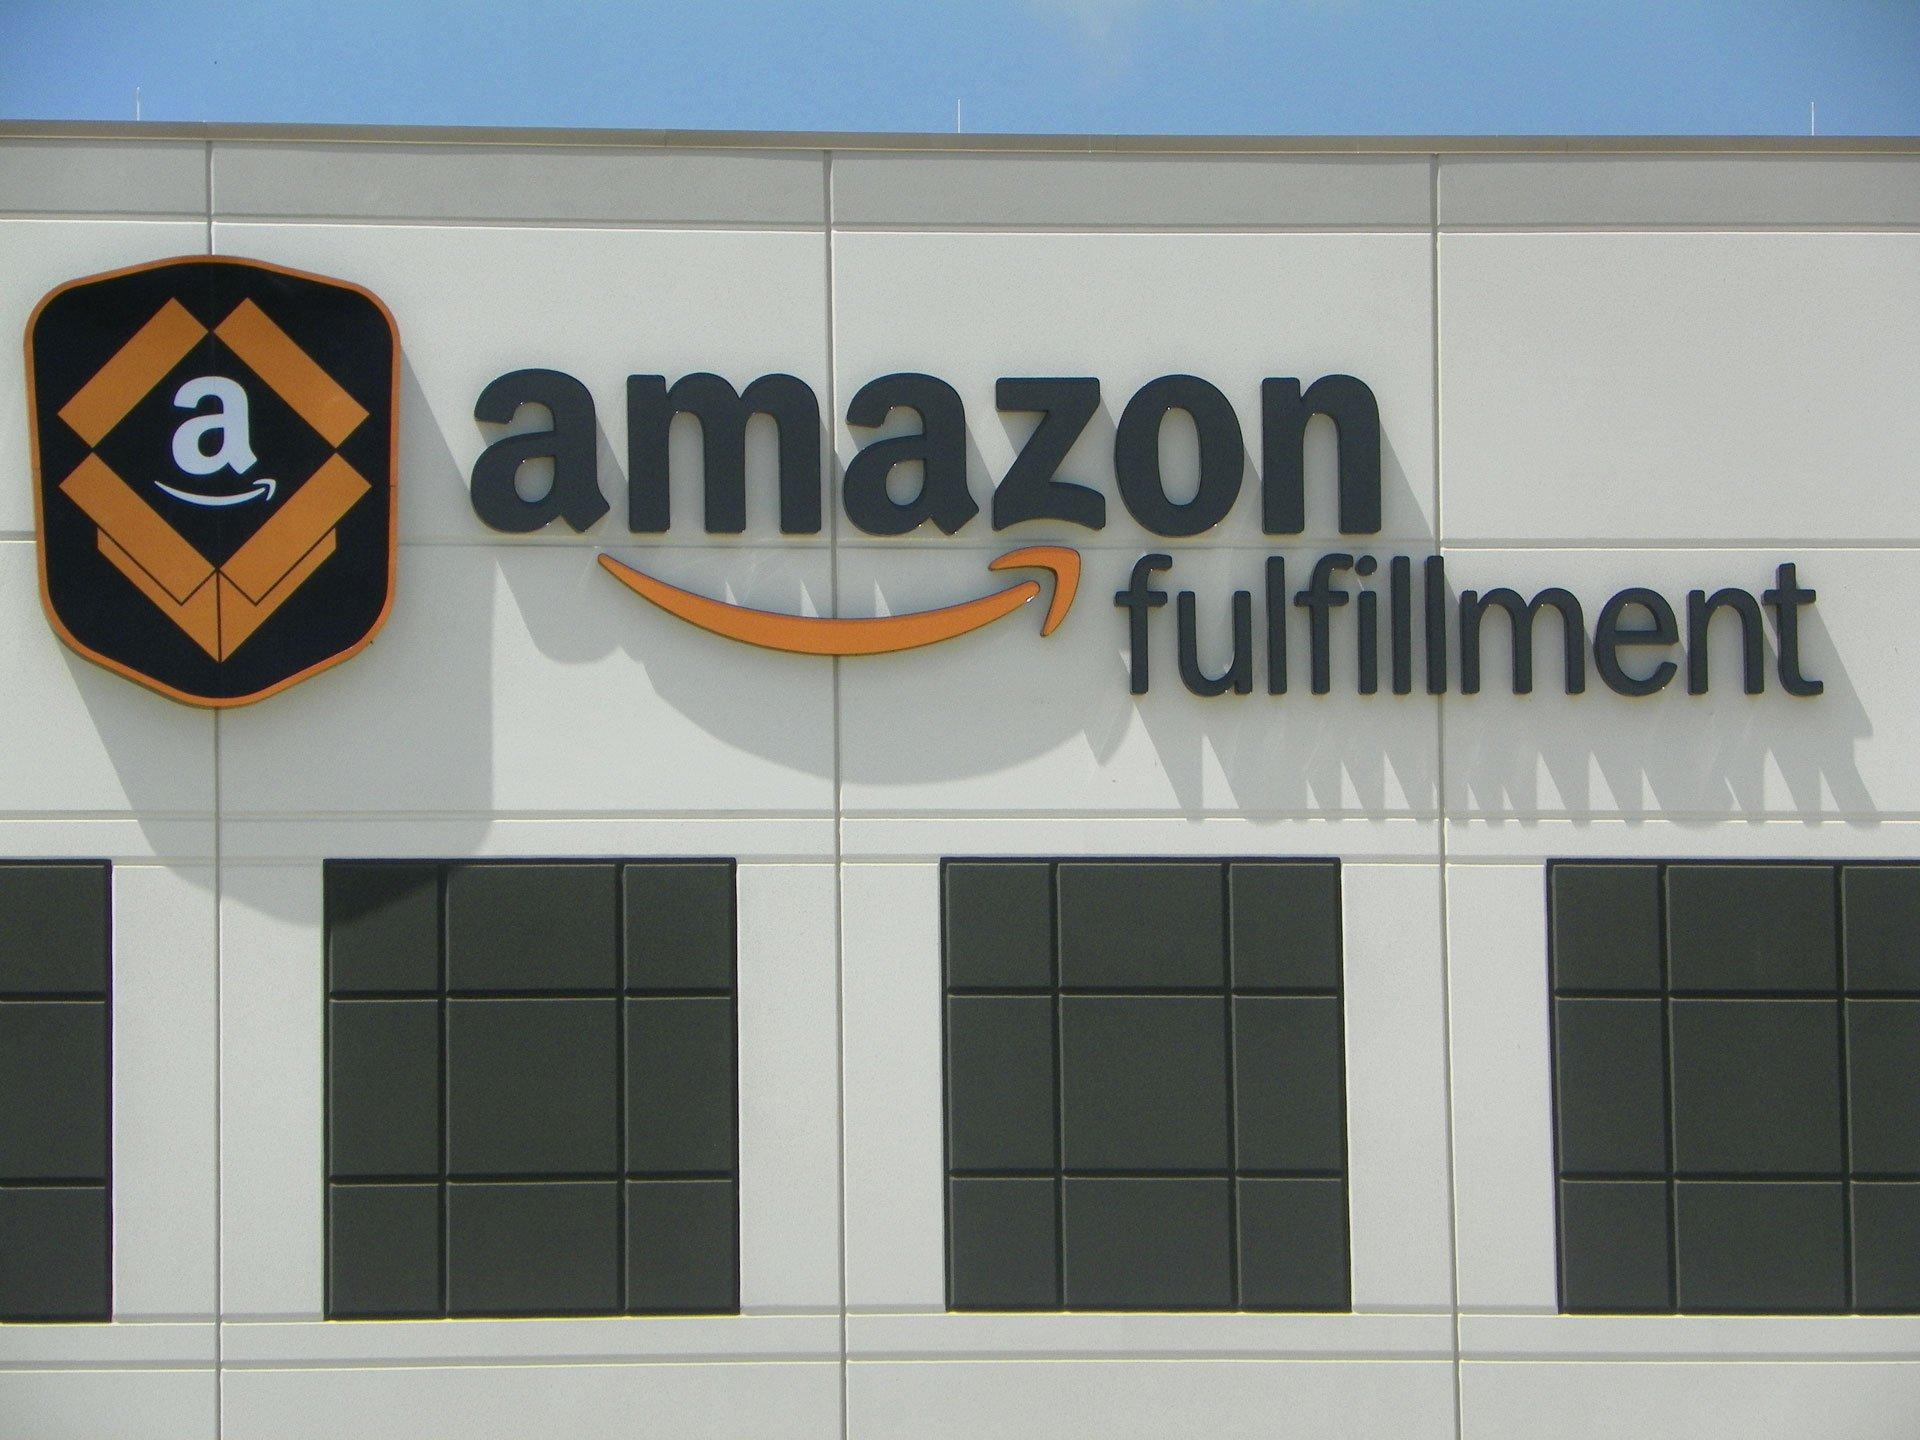 Amazon Fulfillment Sign